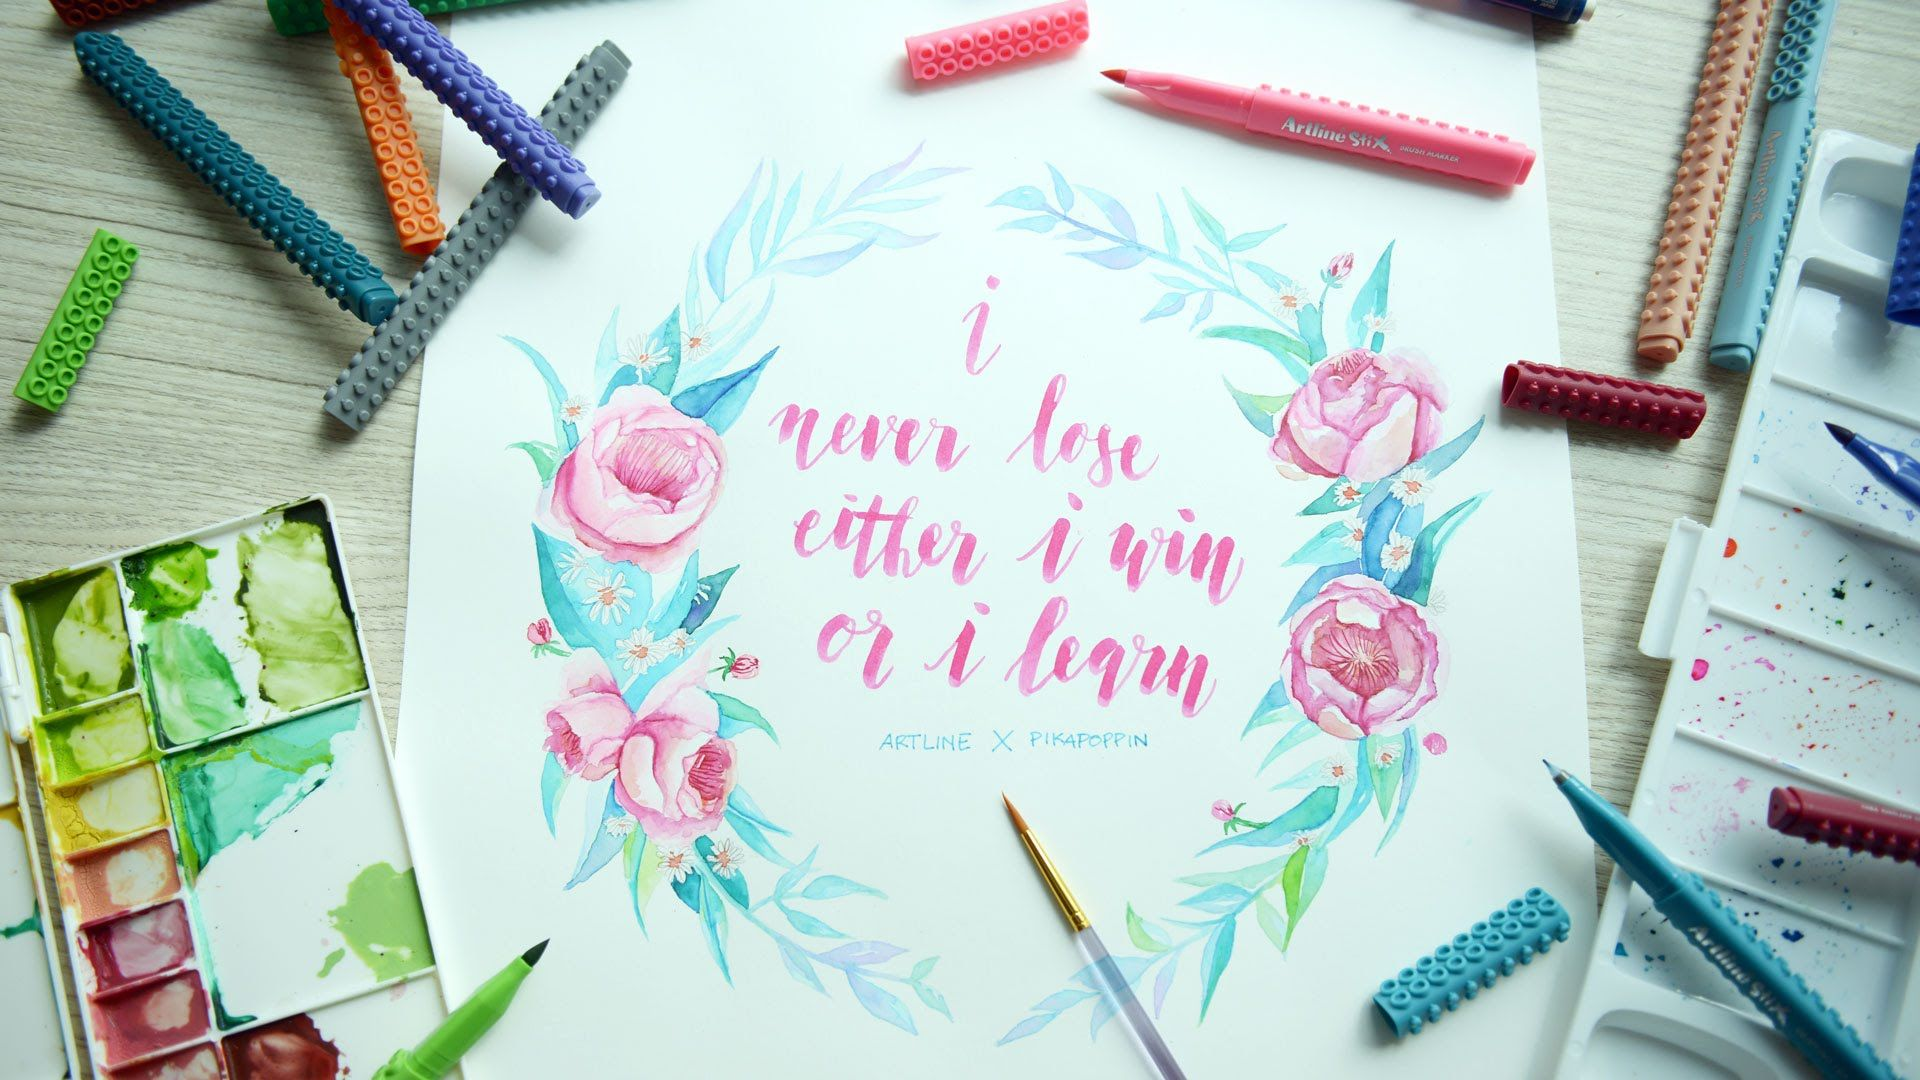 Artline class : flower wreath watercolour pikapoppin calligraphy